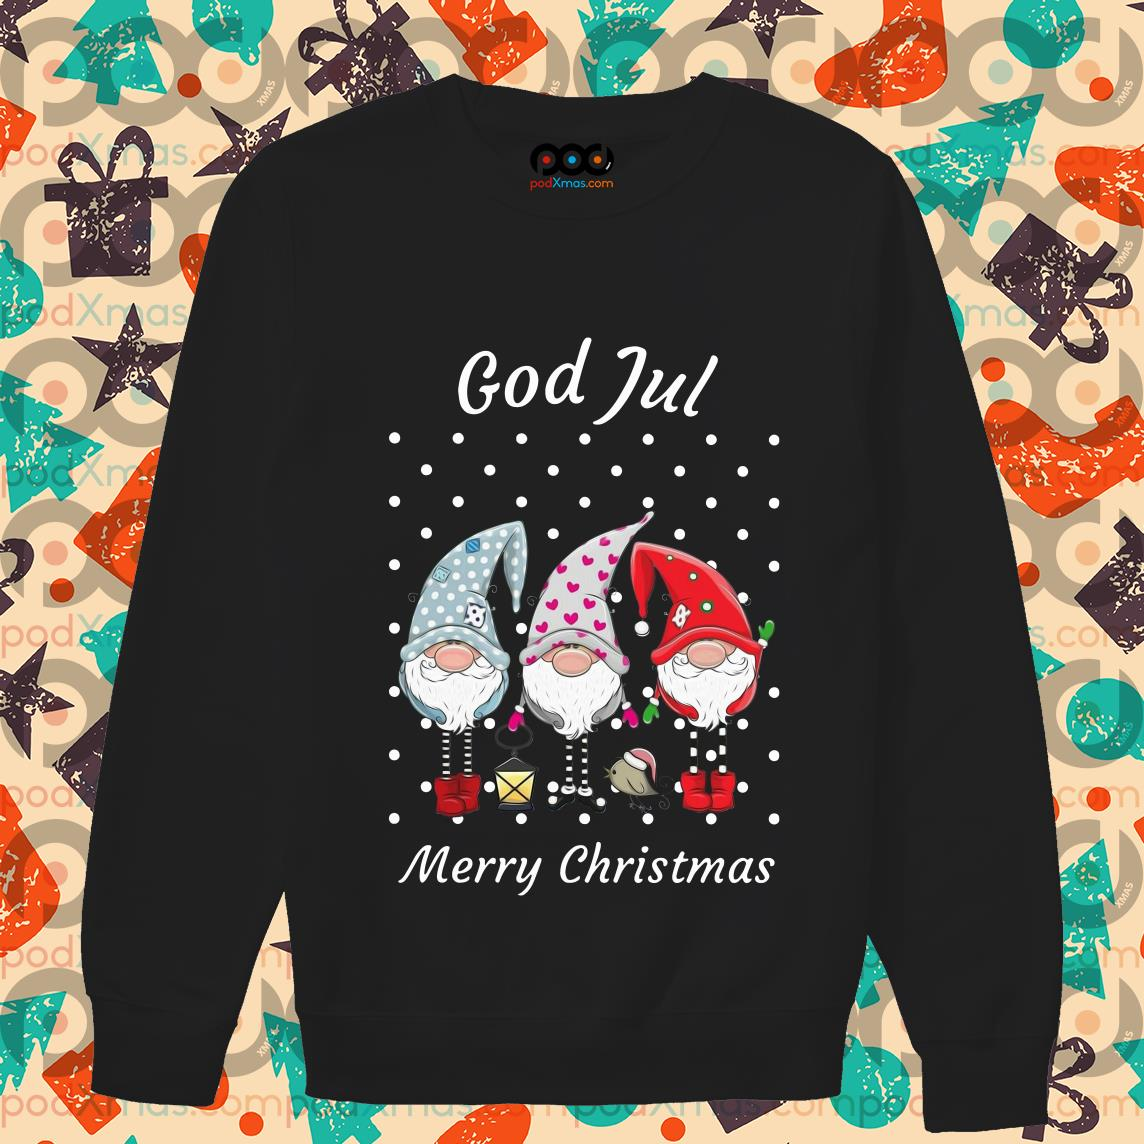 God jul Merry Christmas Sweden Tomte Gnome sweater